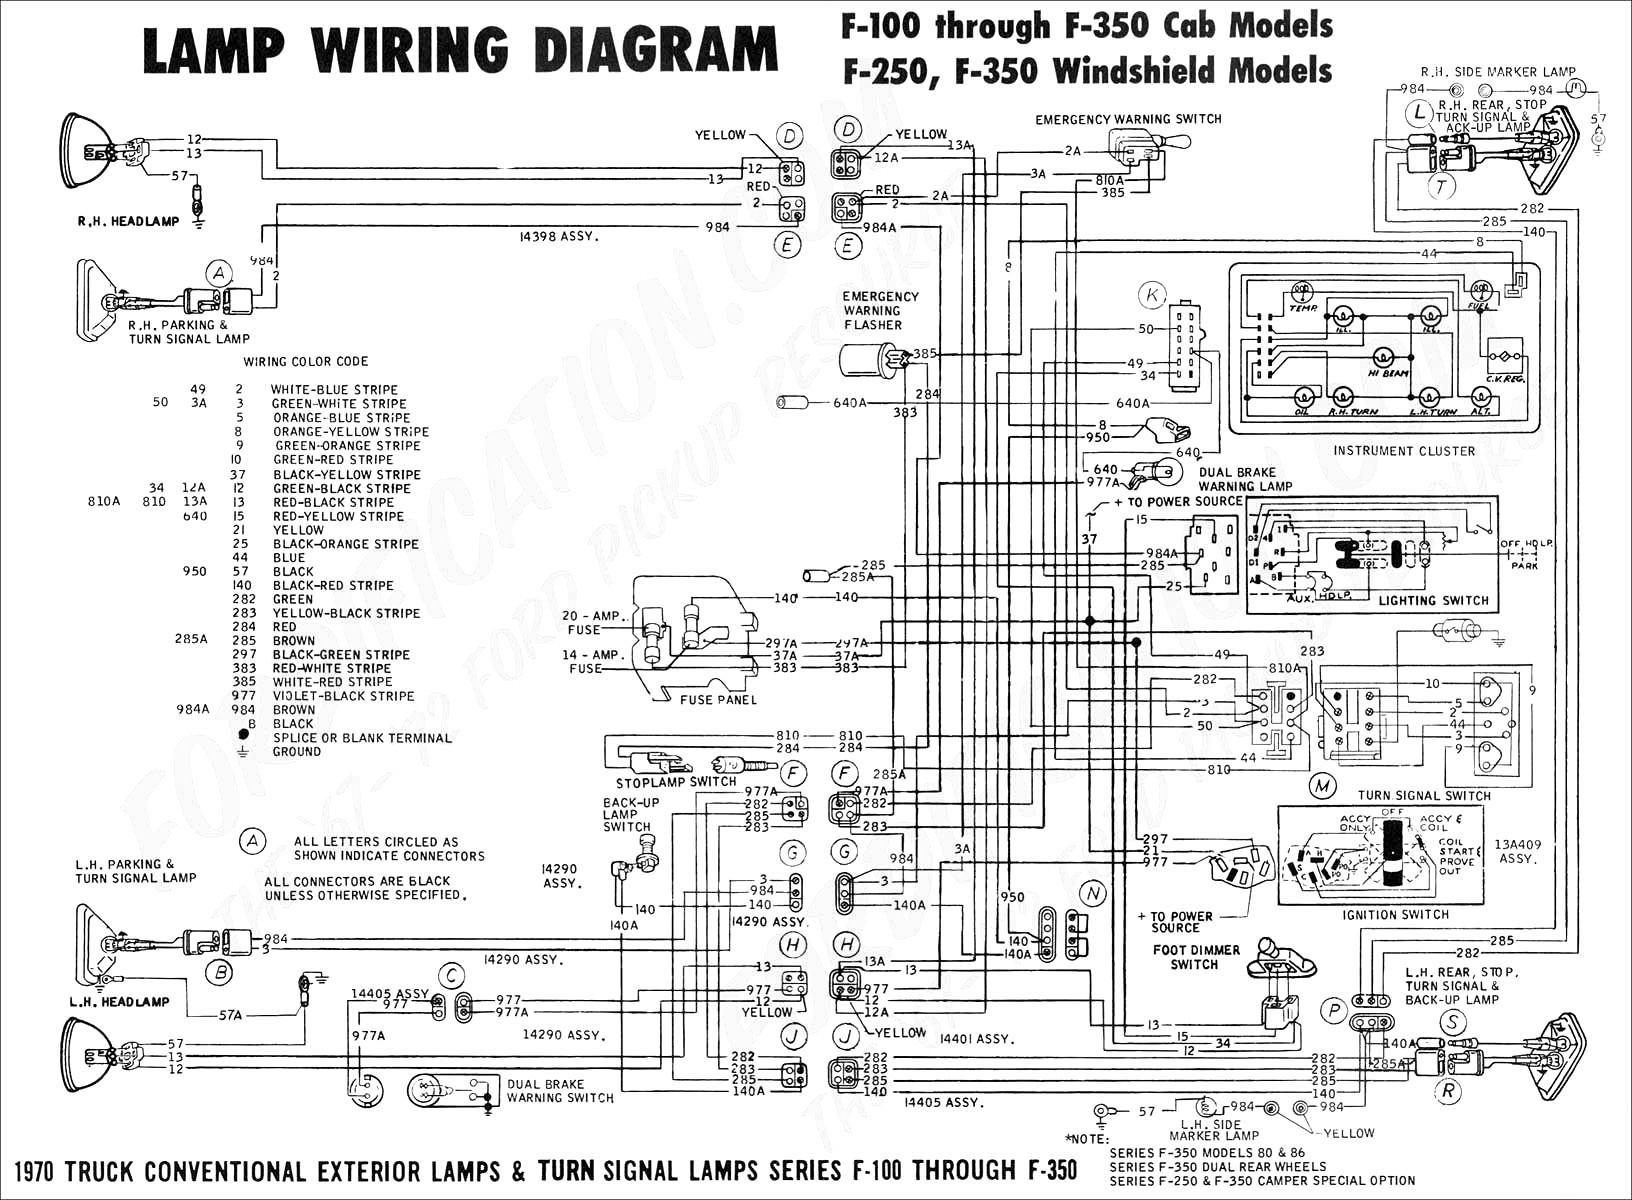 Ford Plug Wiring Diagram   Wiring Diagram - 2001 Ford Mustang Spark Plug Wiring Diagram